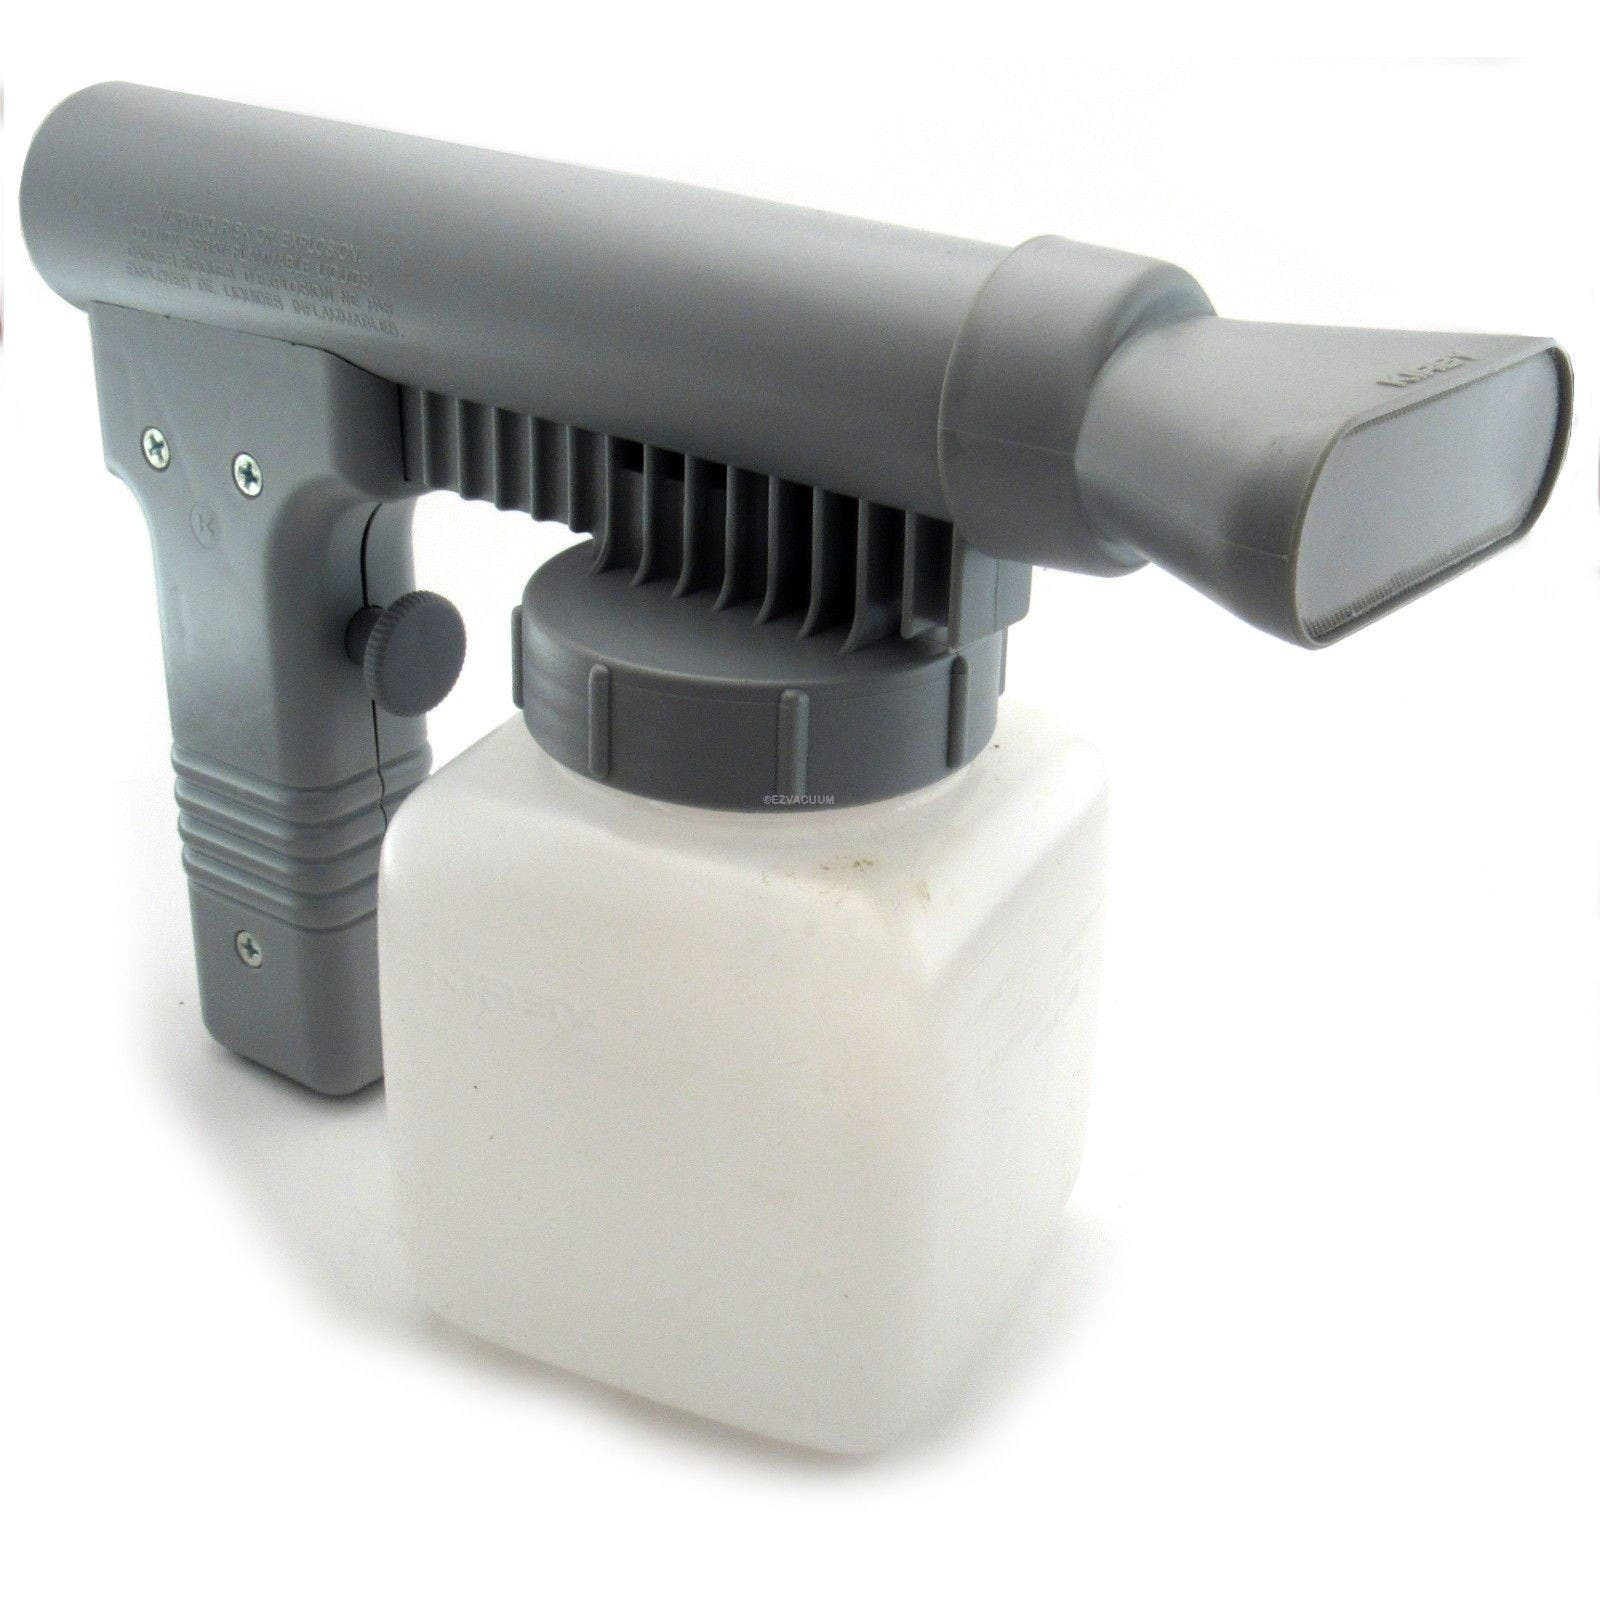 Kirby Carpet Shampoo Spray Gun 250299s 250299 250297 250293 250088